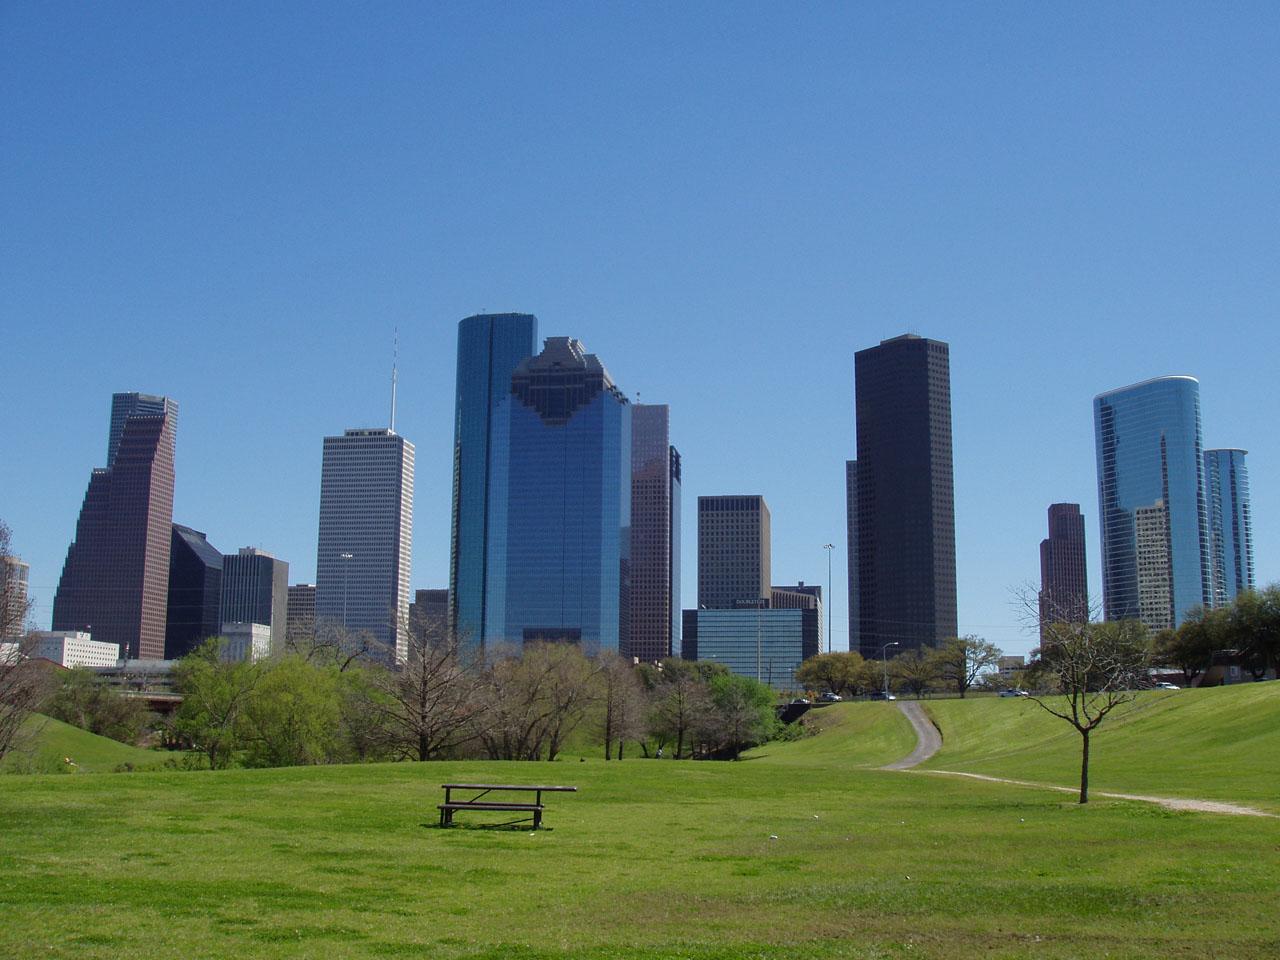 Houston skyline image